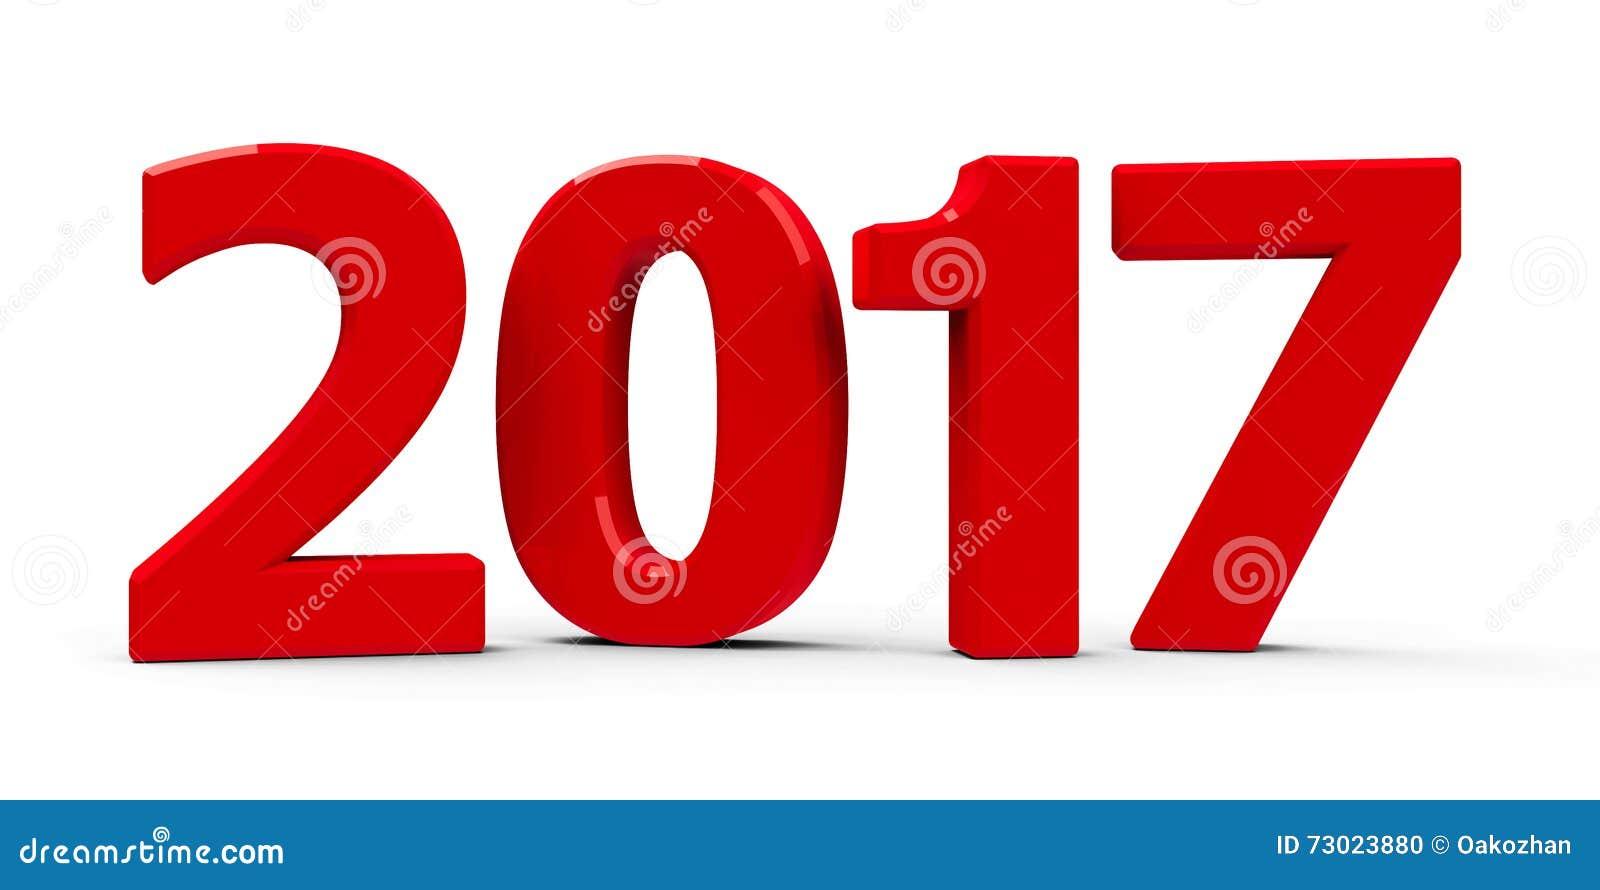 2017 Icon Stock Illustration - Image: 73023880